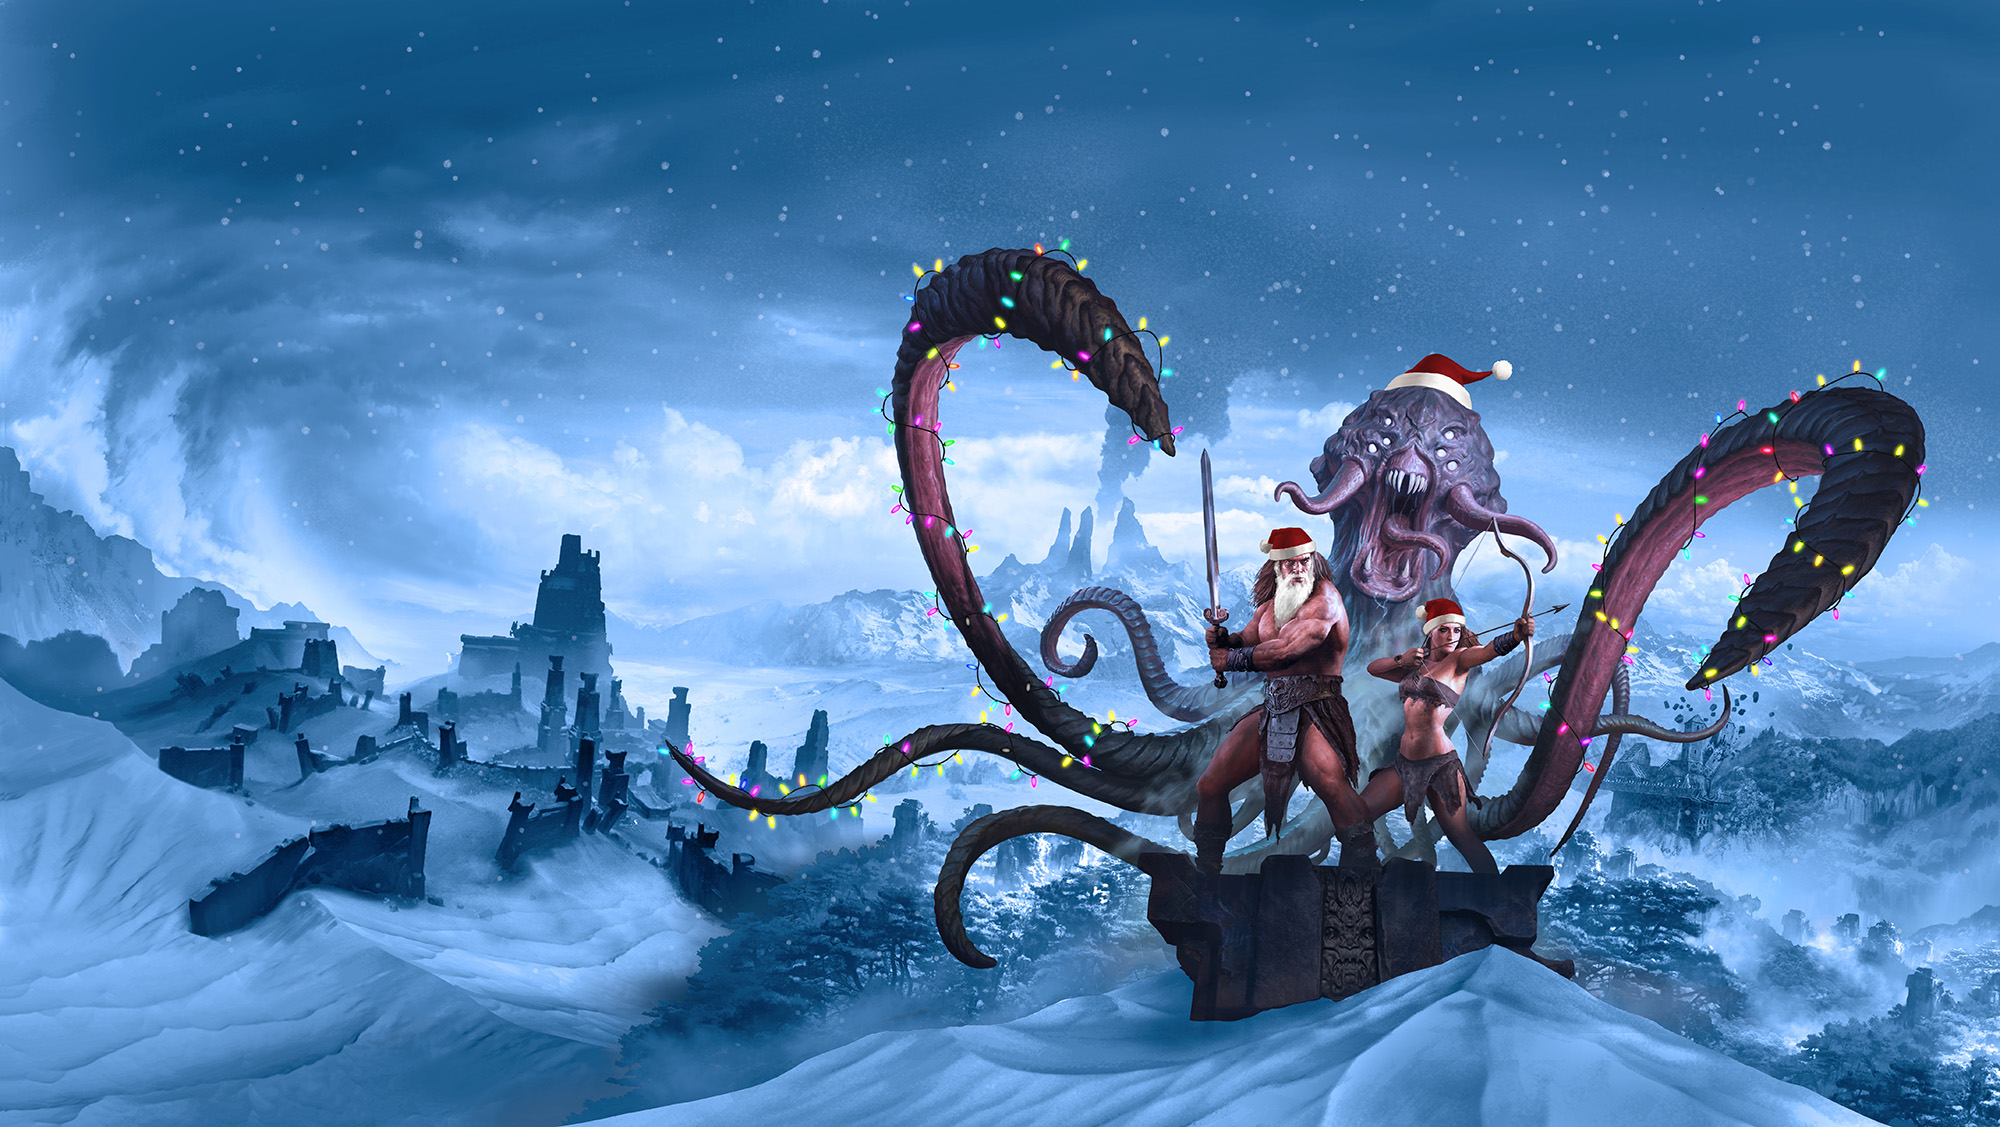 Christmas_Card_NoText